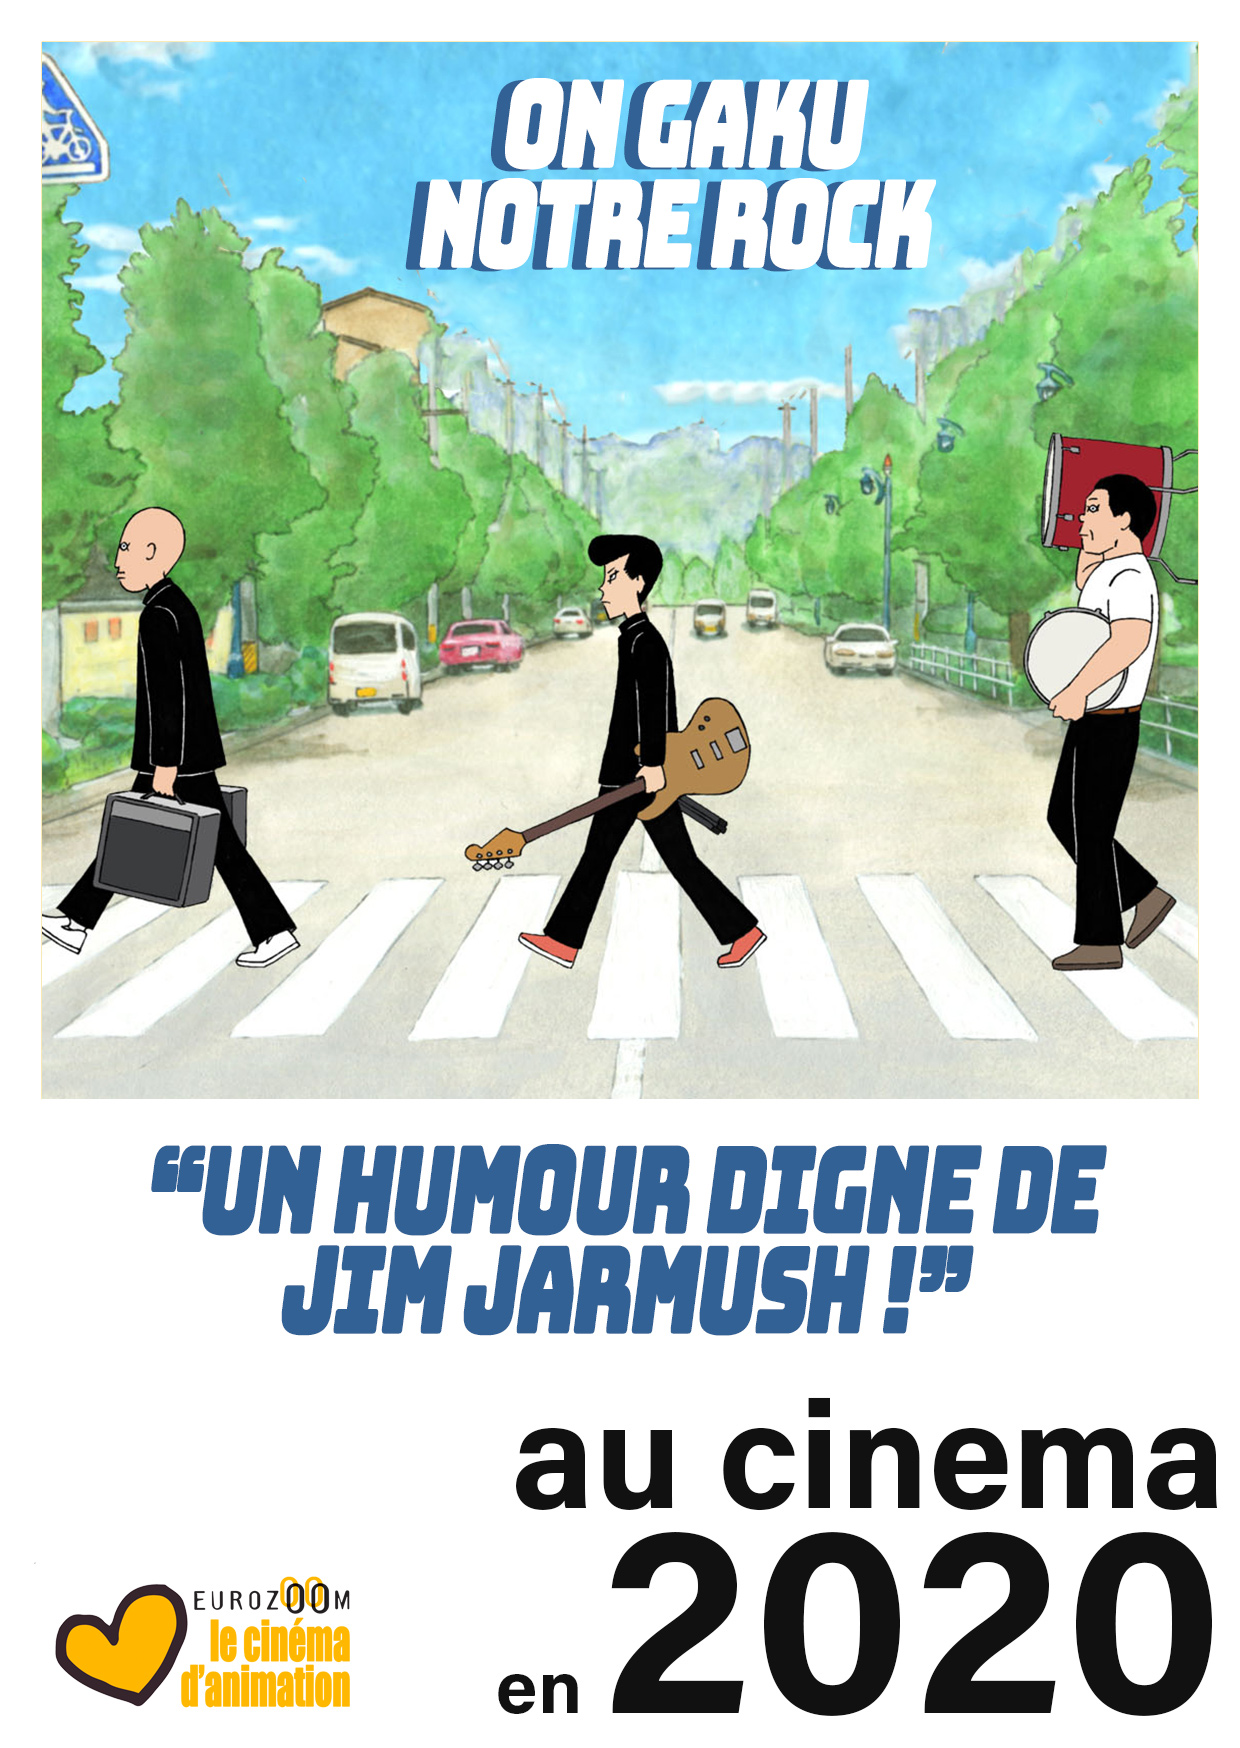 On Gaku, premier poster français